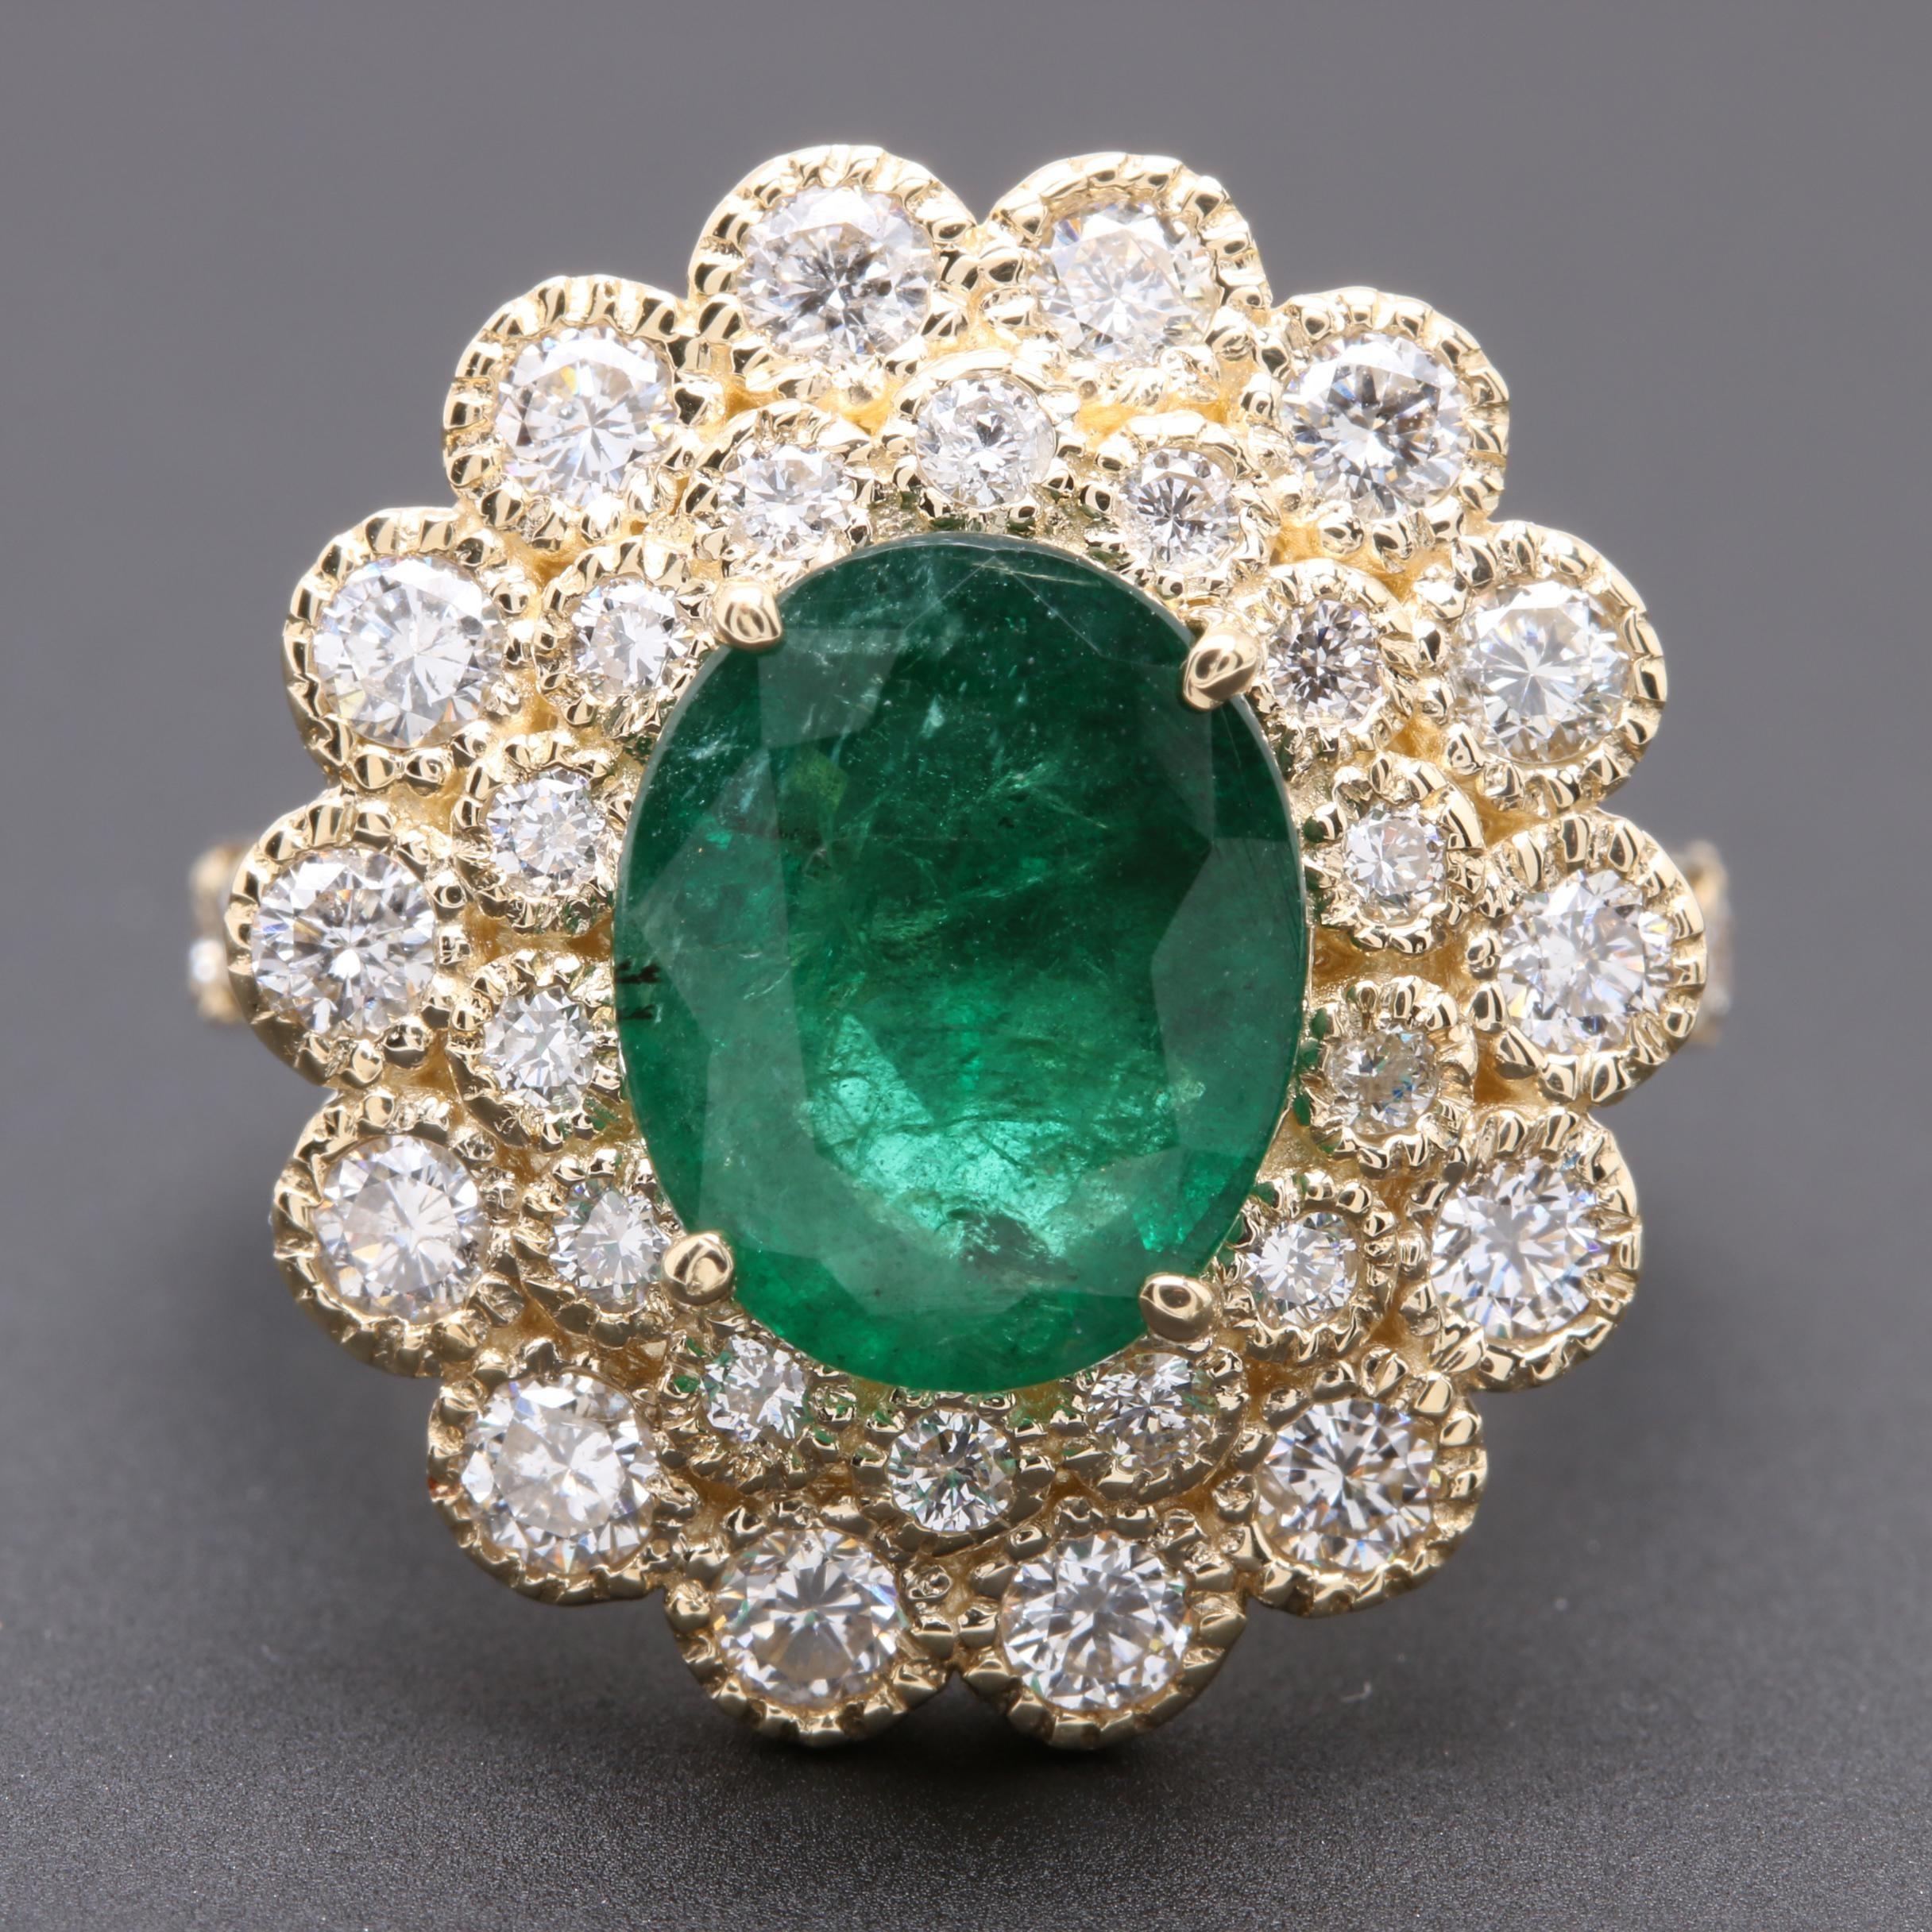 14K Yellow Gold 2.89 CT Emerald and 1.42 CTW Diamond Ring